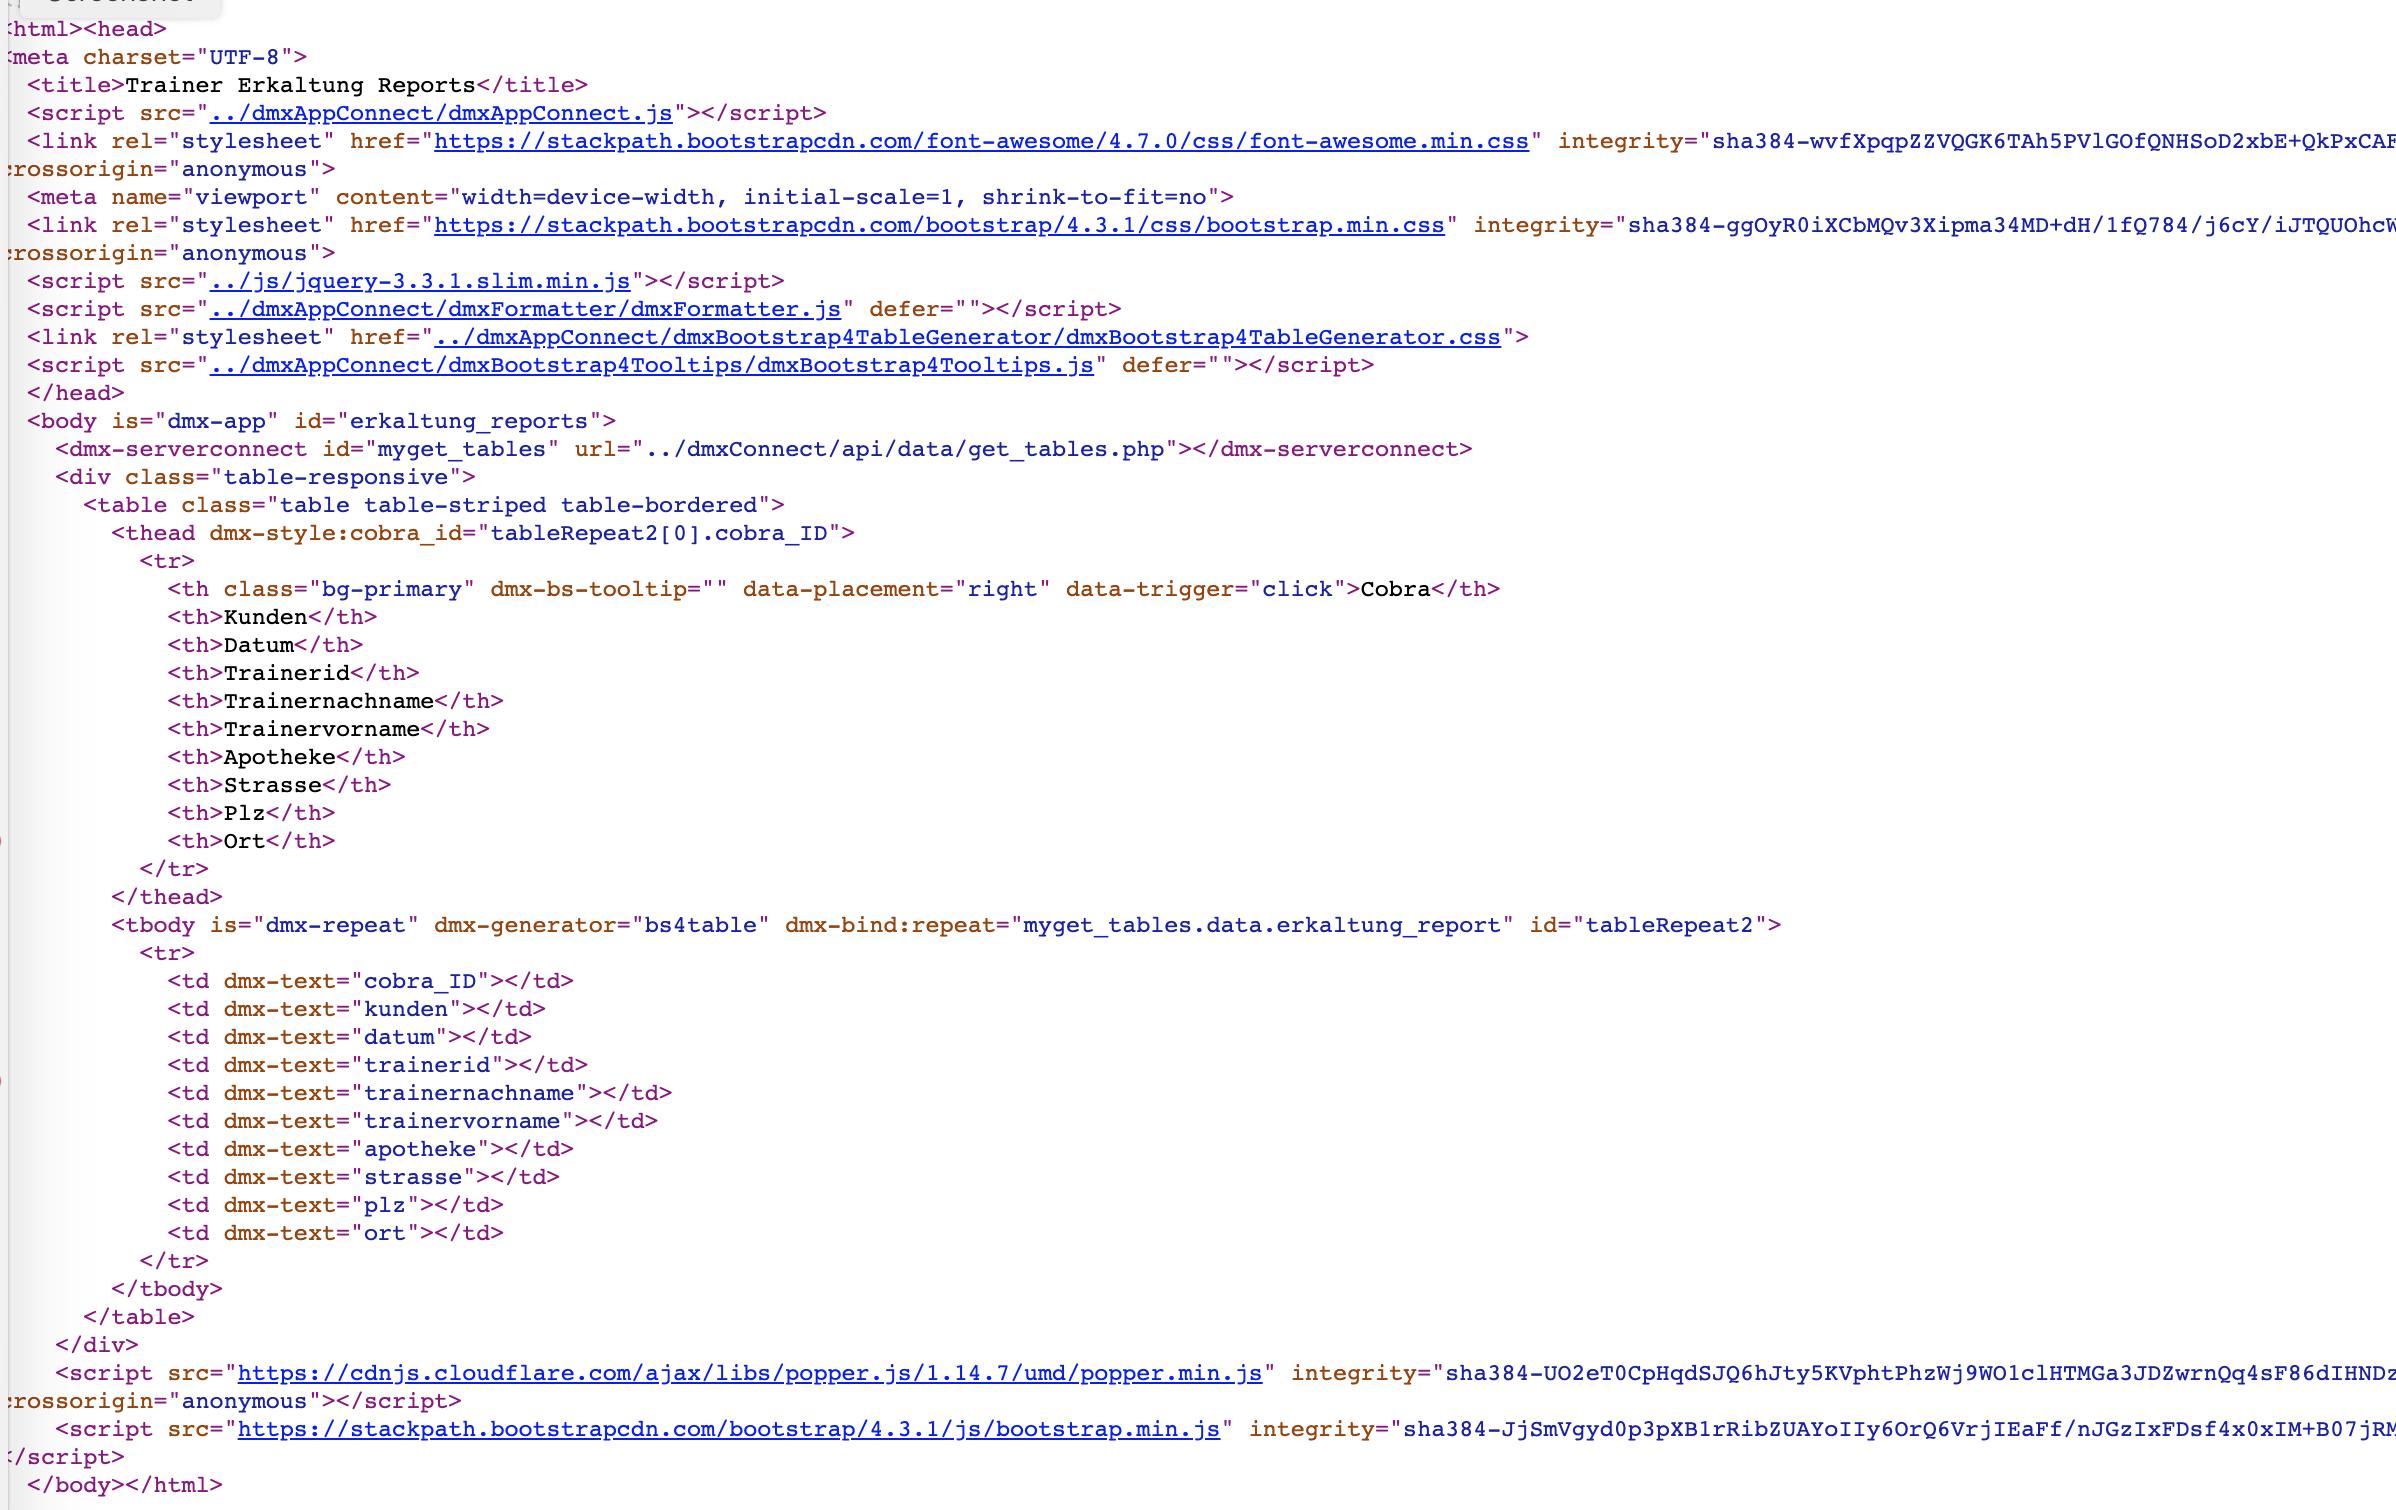 Search Filter blocking data table display - Wappler General